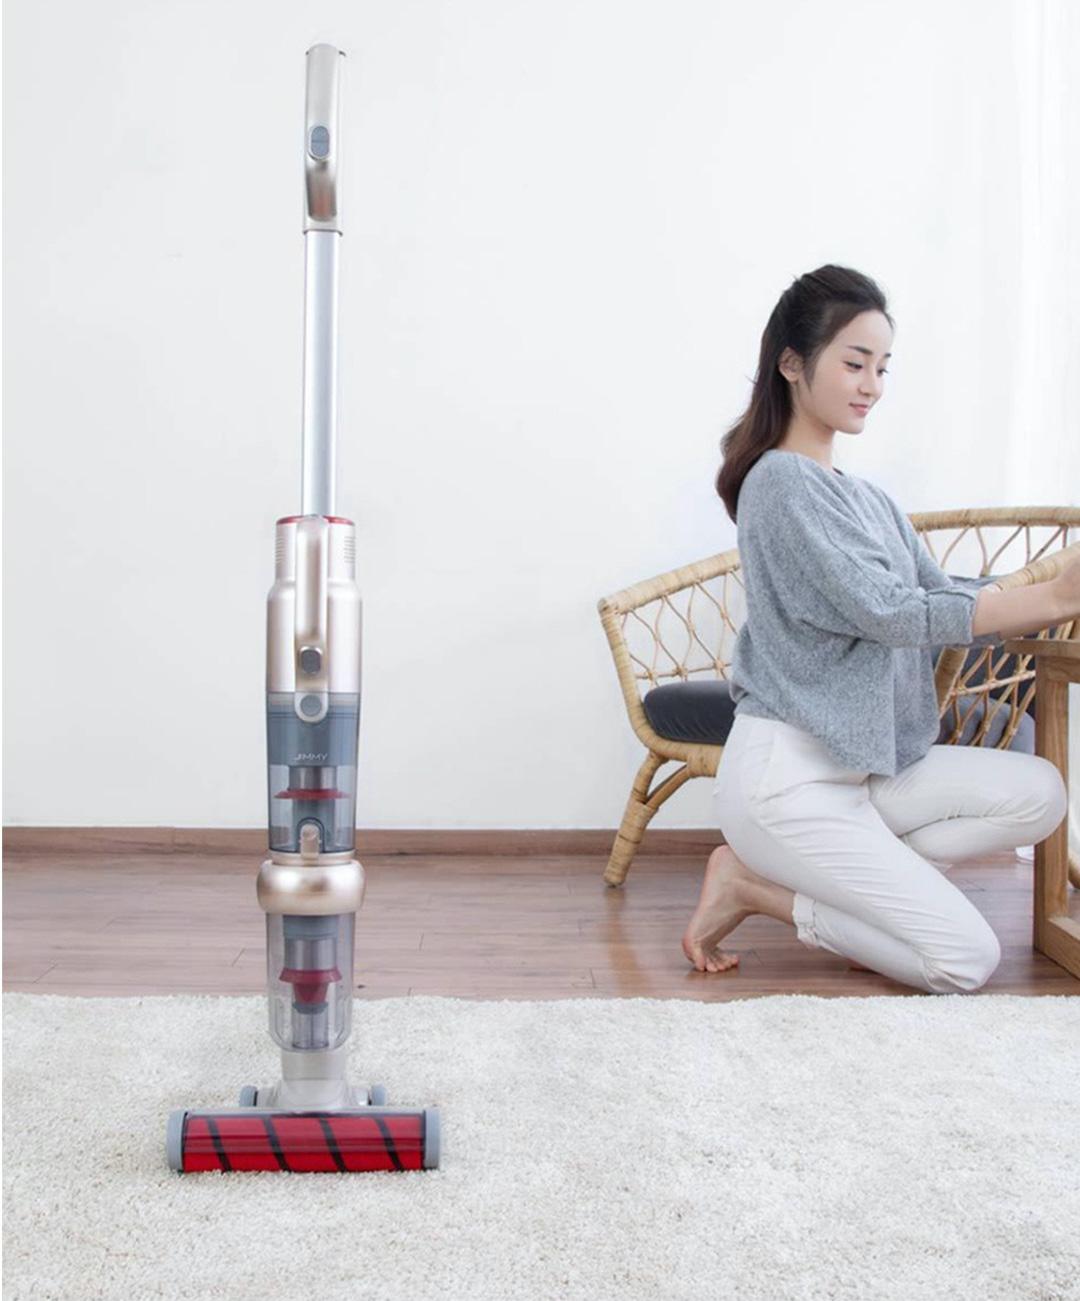 Xiaomi Jimmy Cordless Handheld Vertical Vacuum Cleaner JV71